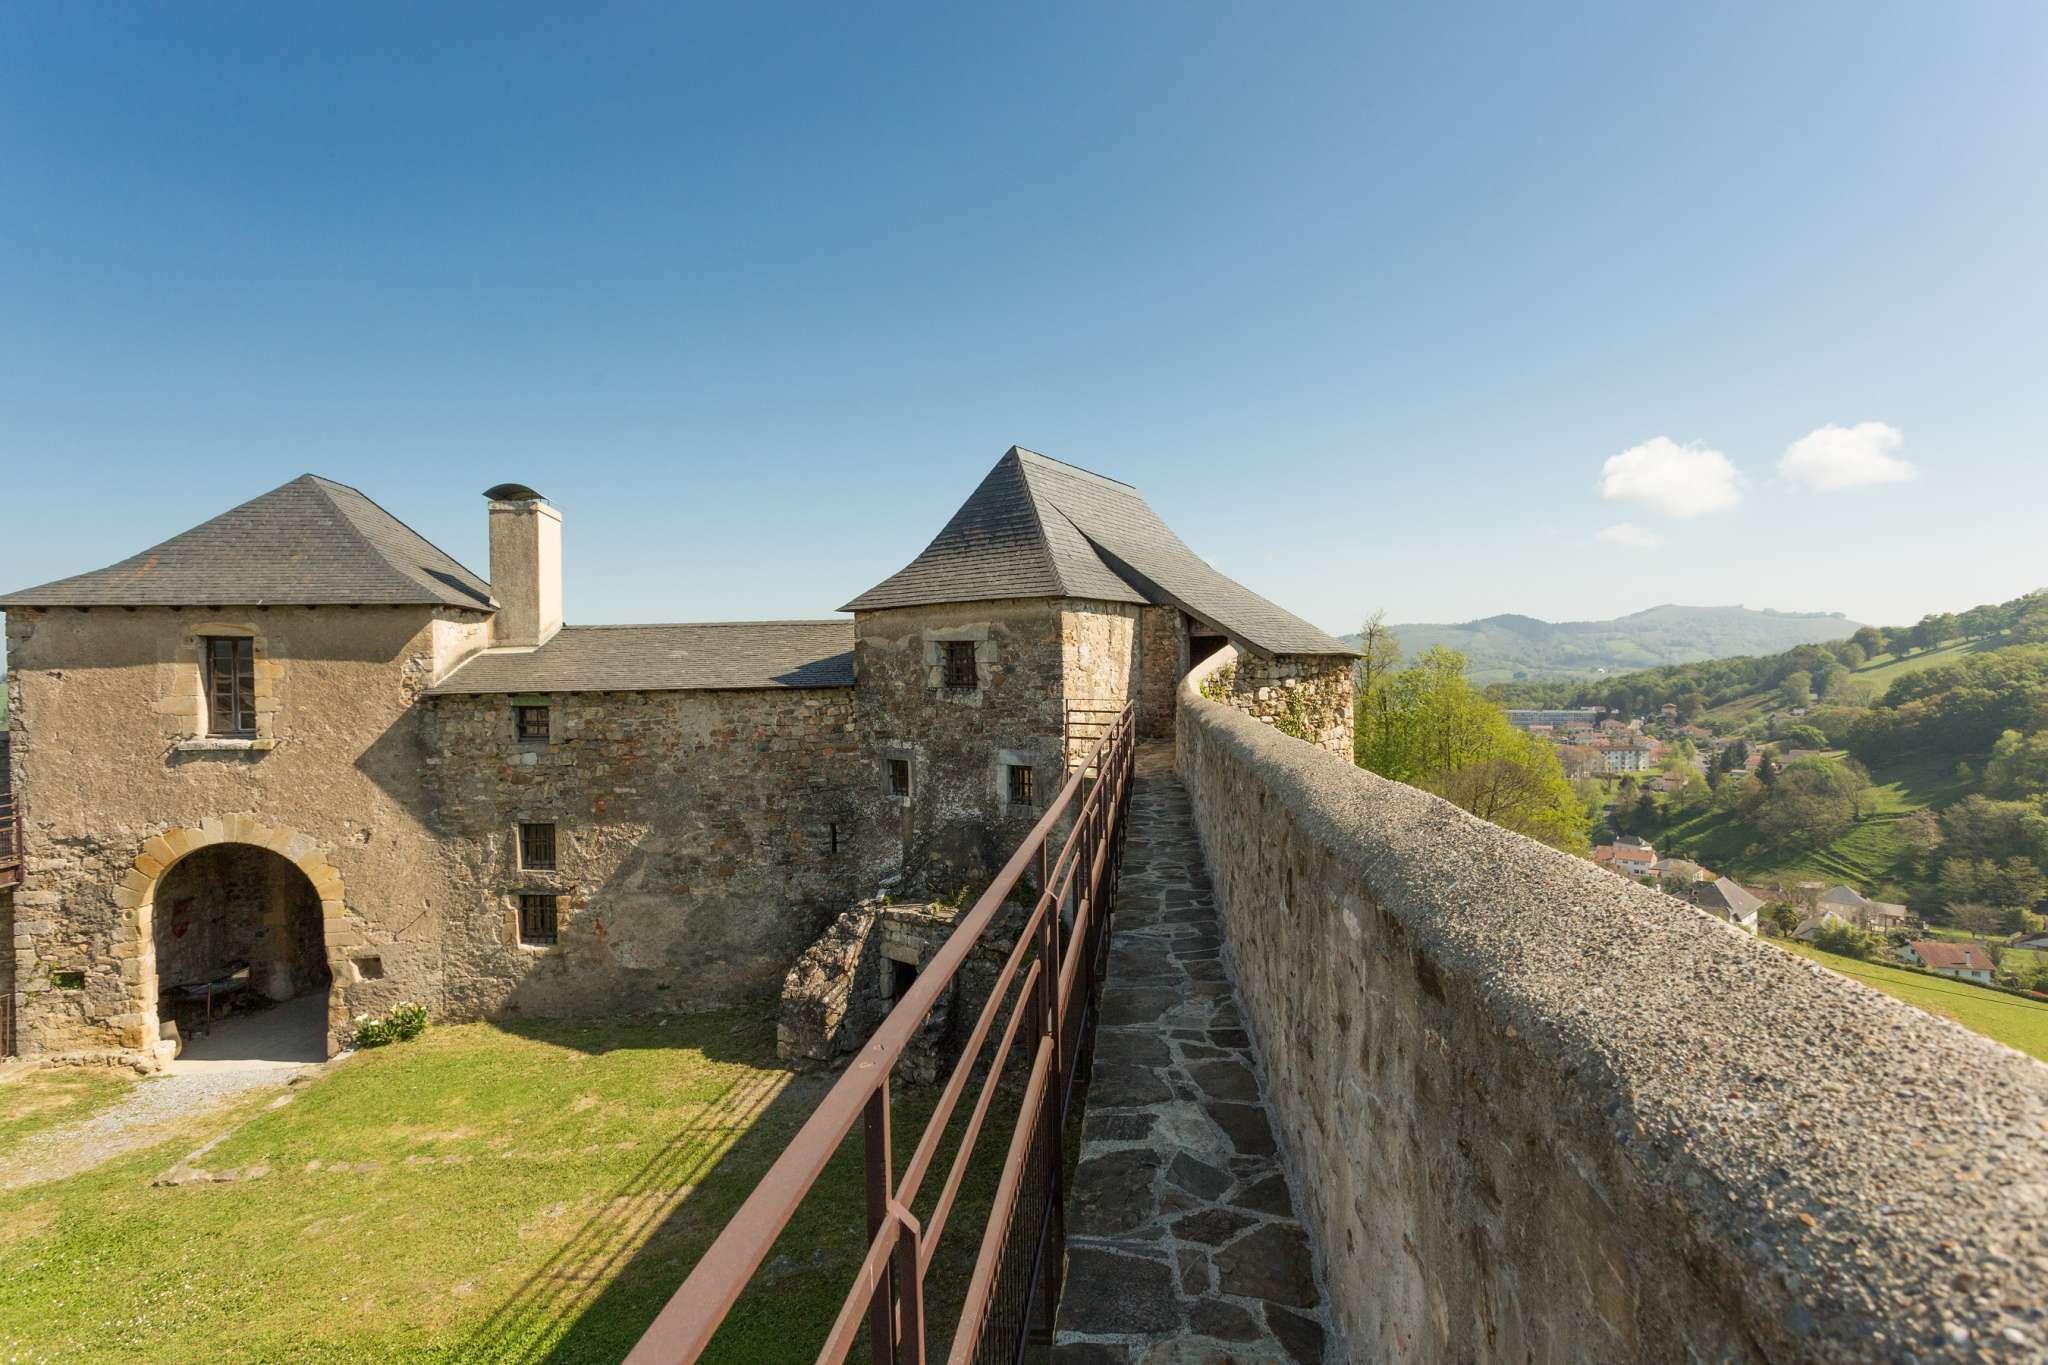 chateau-mauleon-credit-carole-pro-recadre